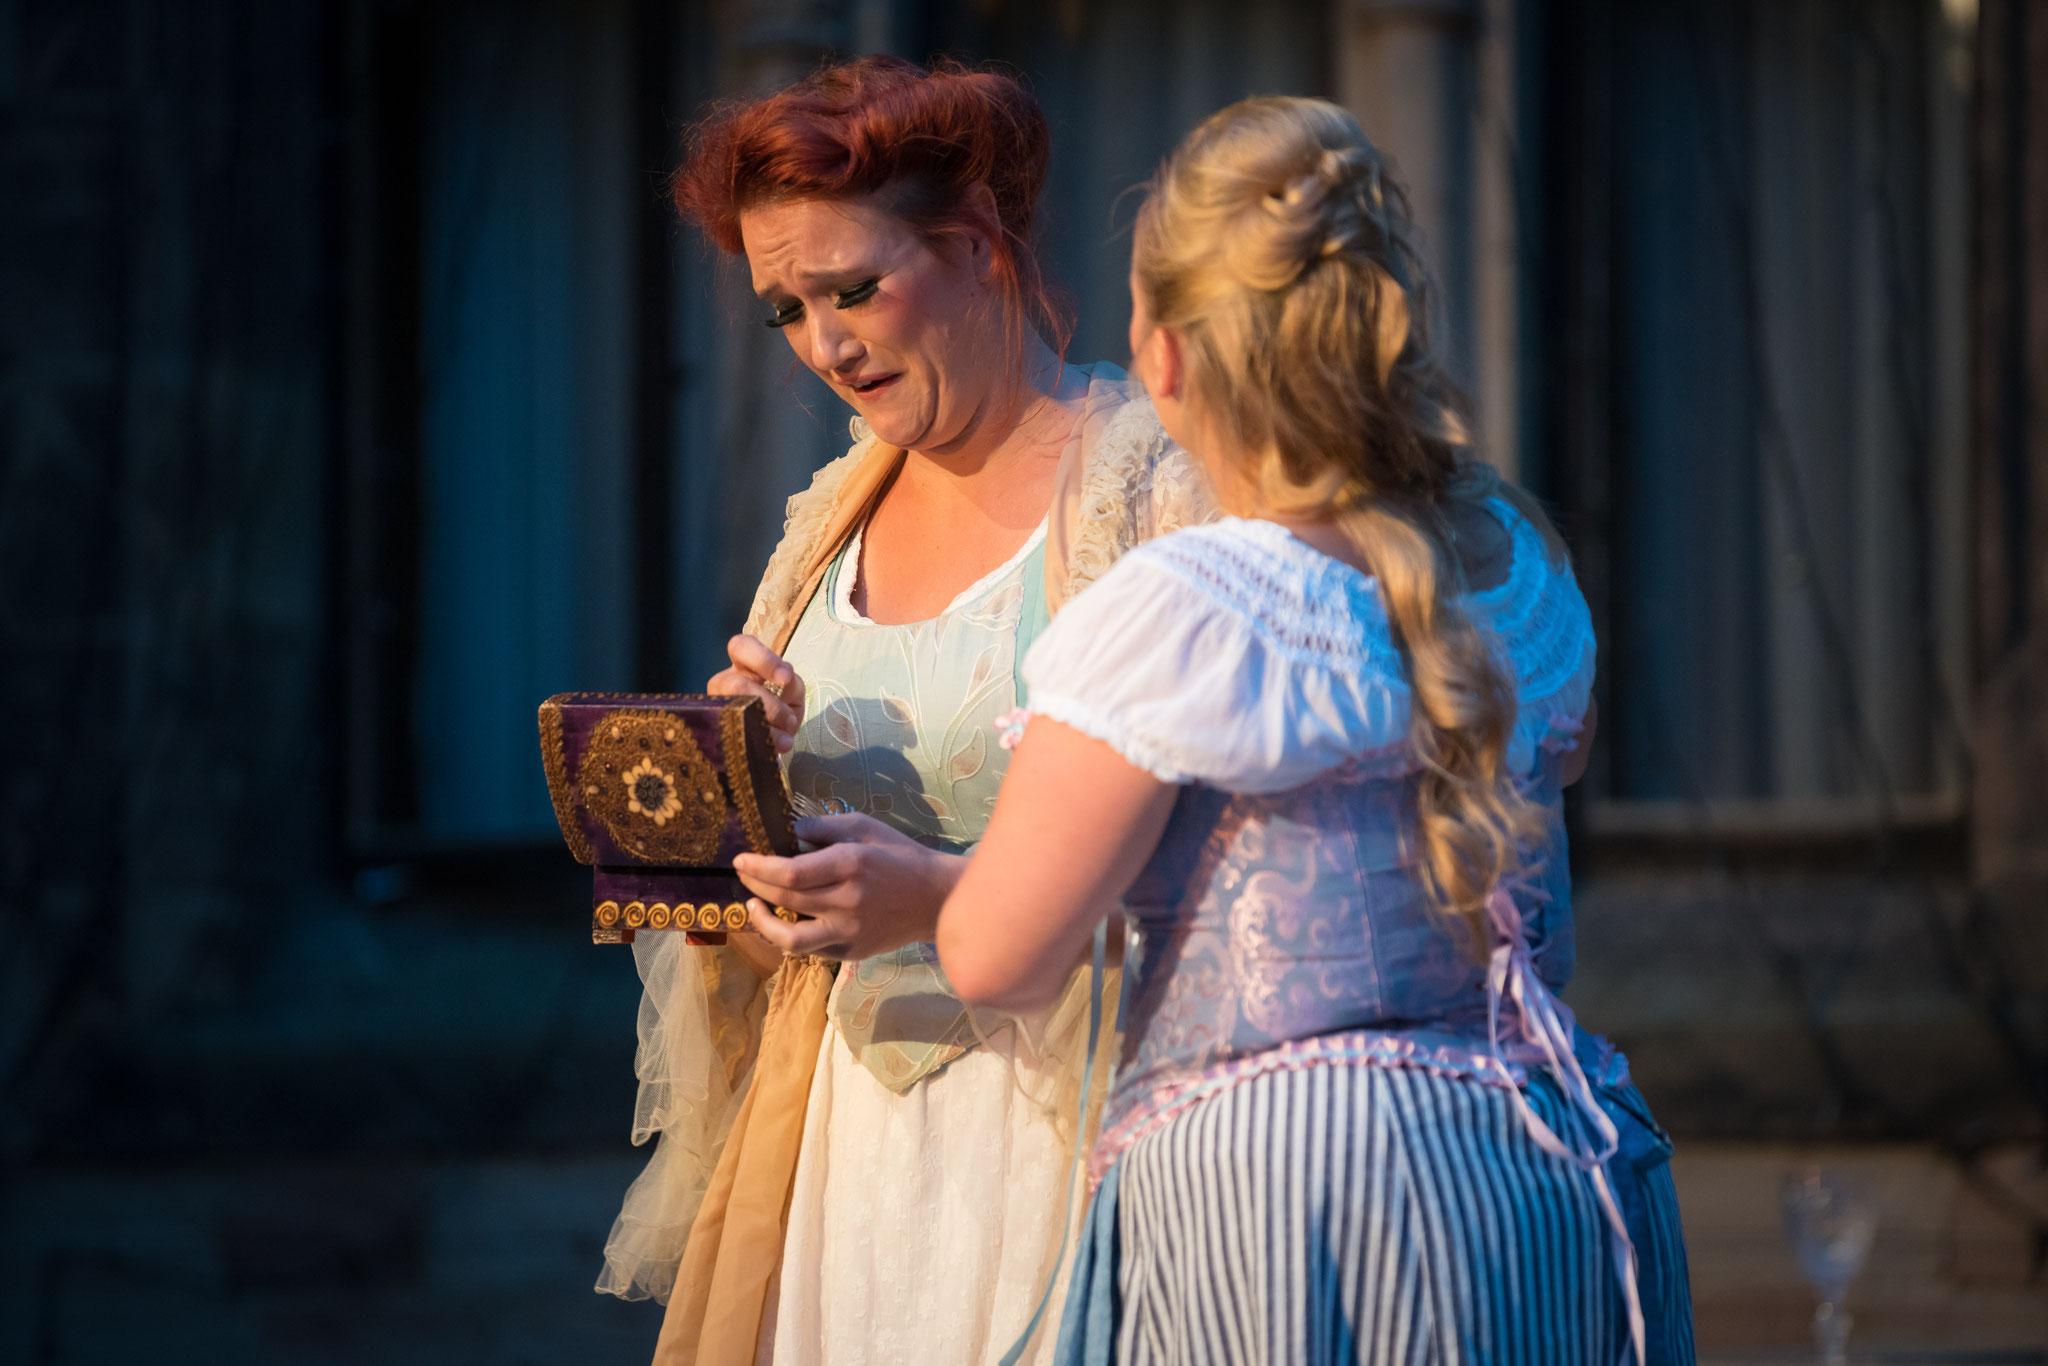 Marthe Schwerdtlein (Gounod: Faust, Schlossfestspiele Wernigerode, August 2017, @Henrik Bollmann)